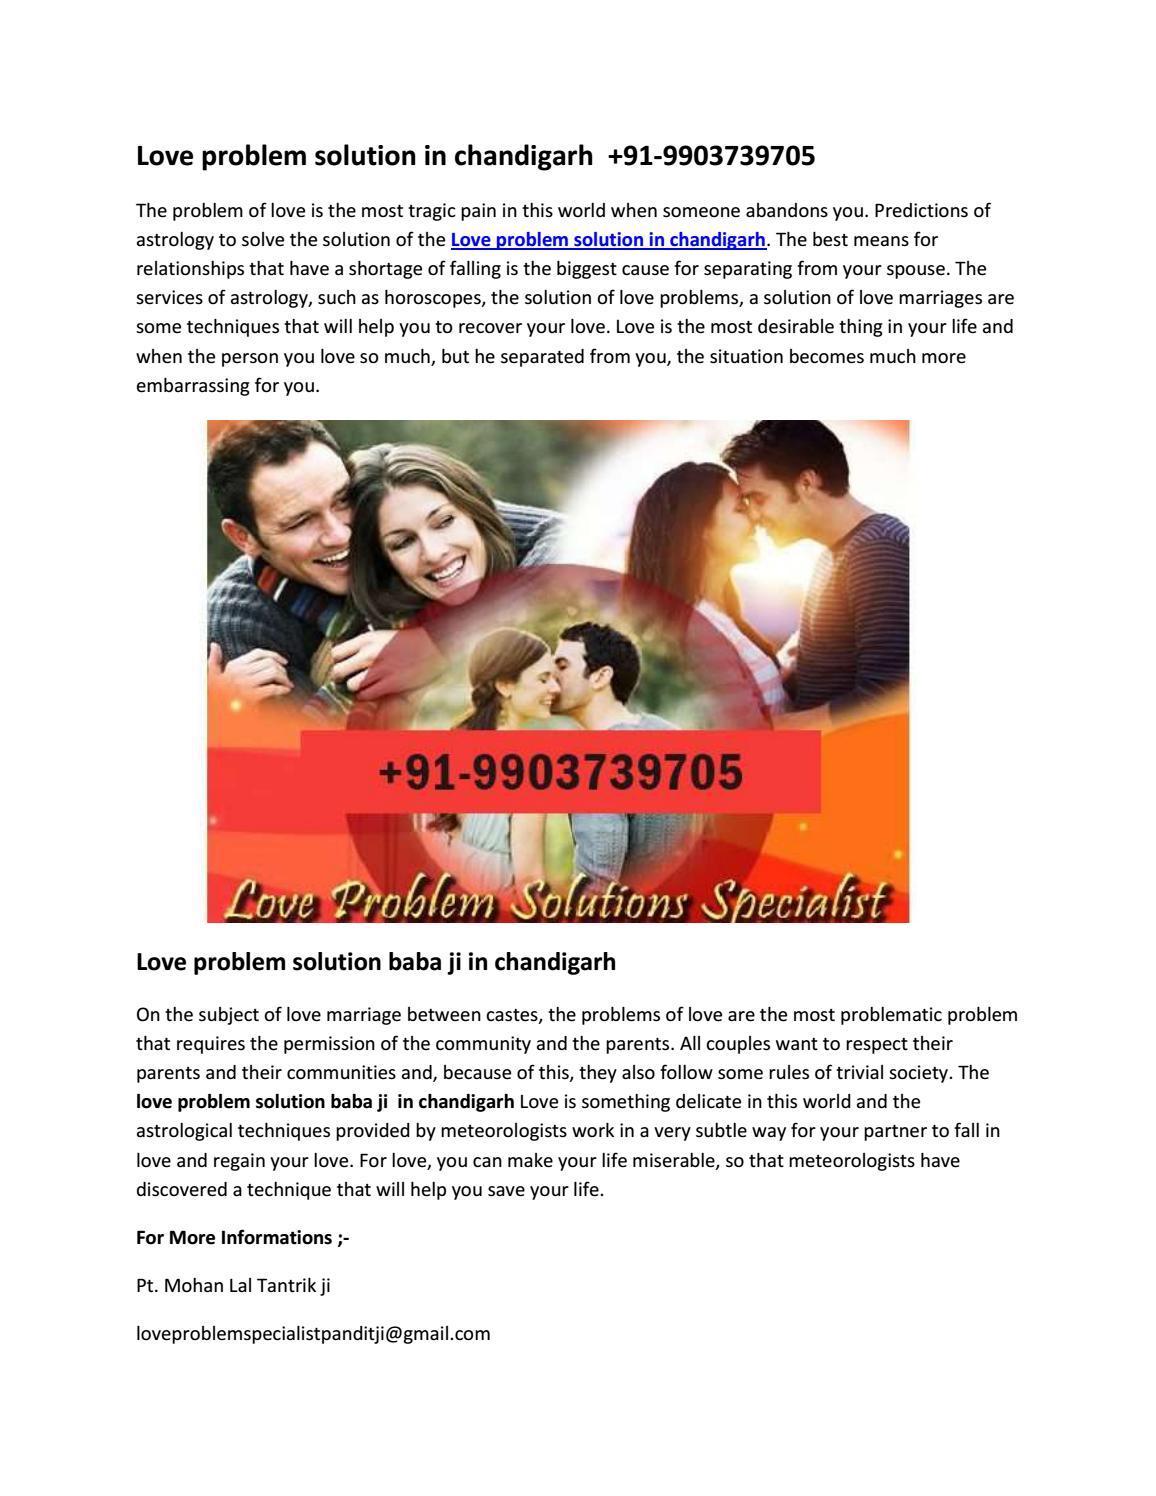 Love Problem Specialist Pandit ji | Love Guru | +91-9903739705